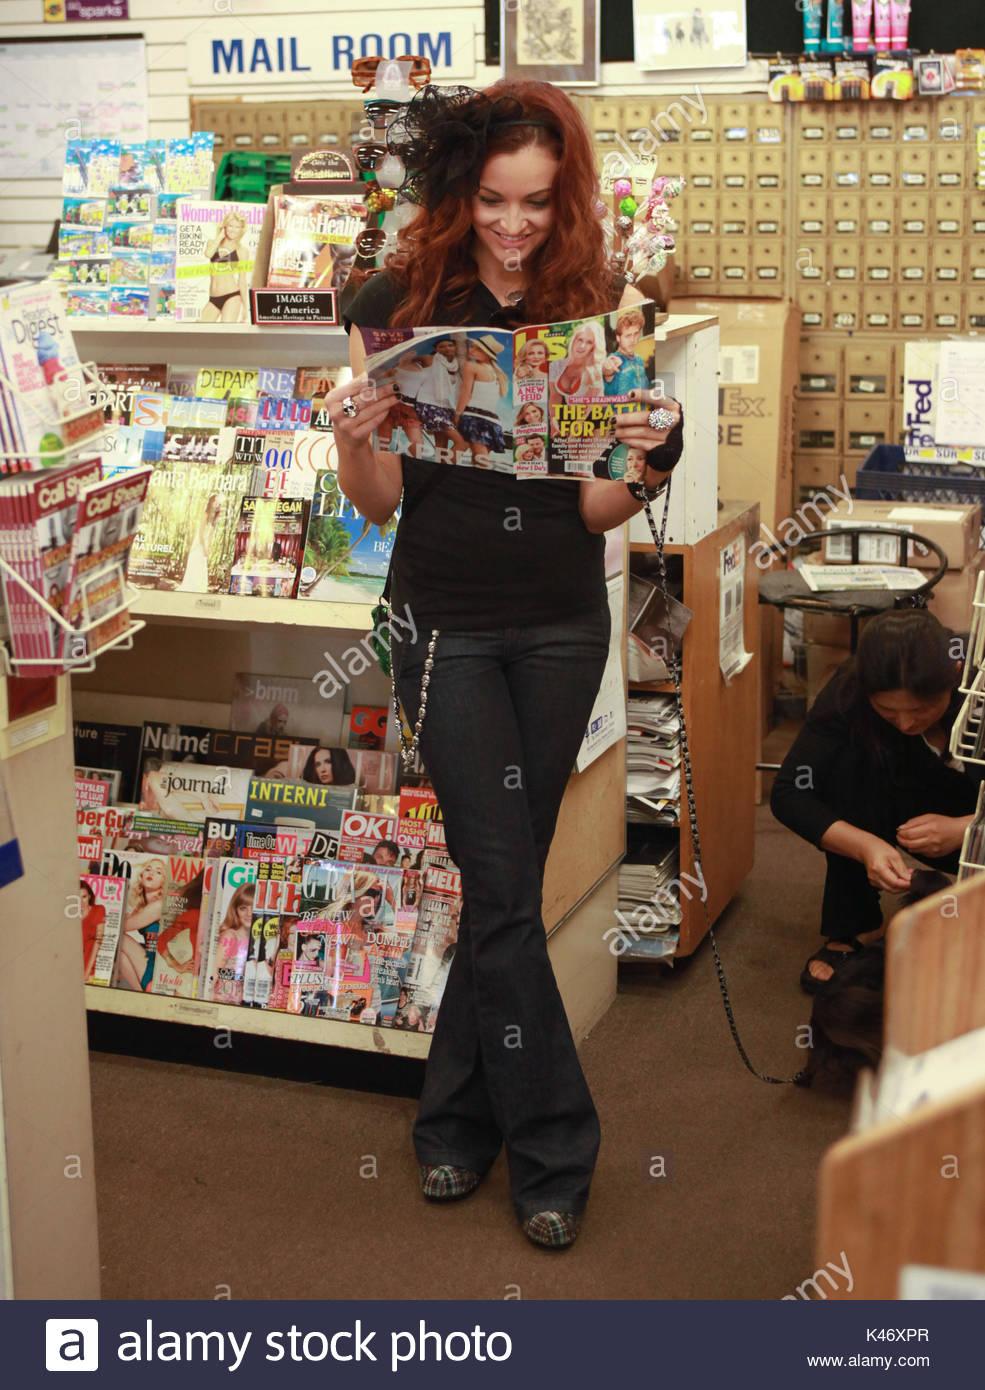 Celebrity Apprentice Recap: March 14th, 2010 - Diva Dirt